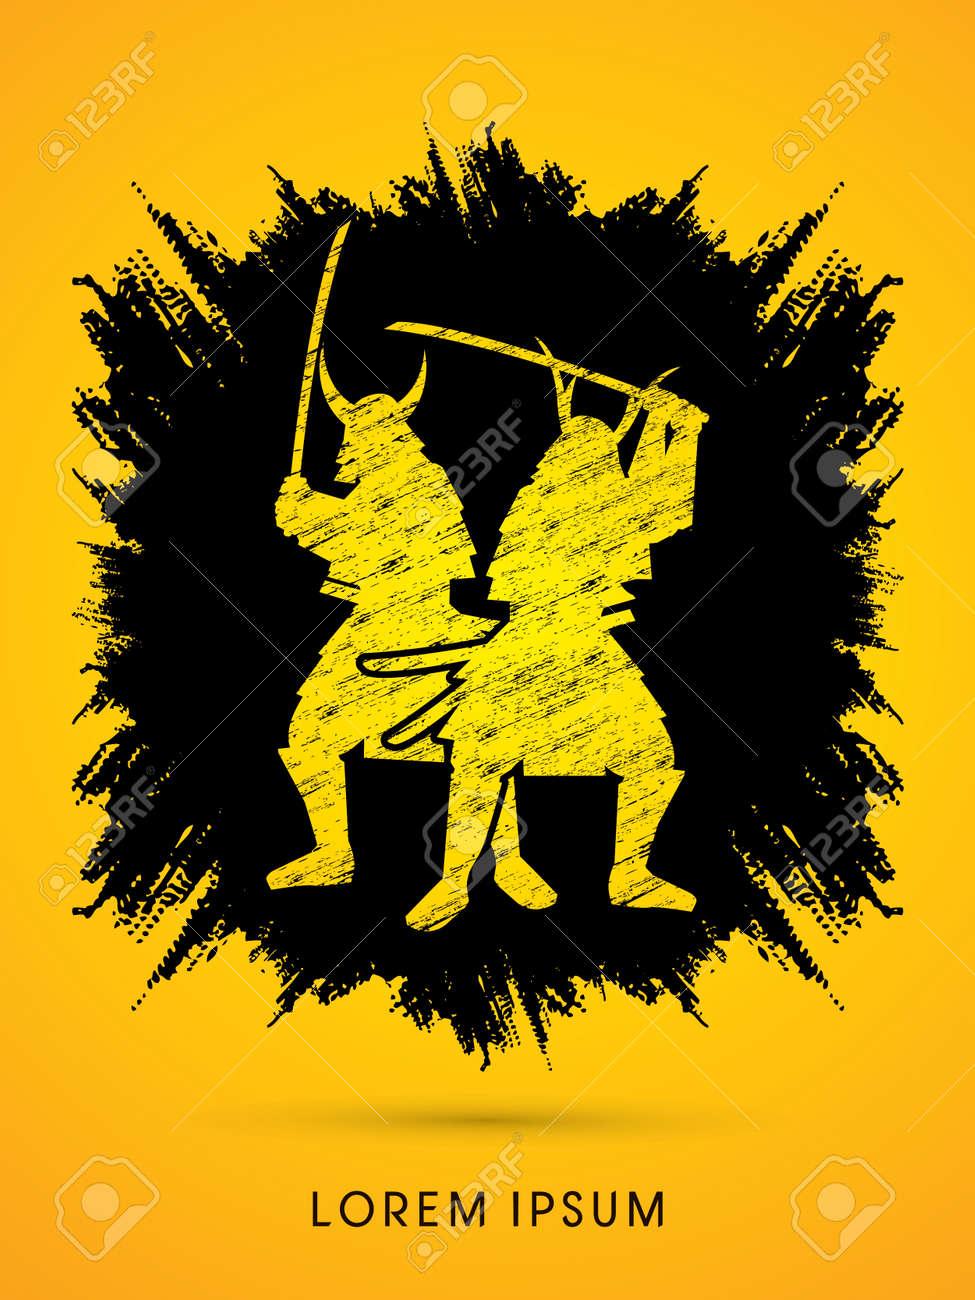 Silhouette Twin Samurai Warrior With Sword Designed On Grunge